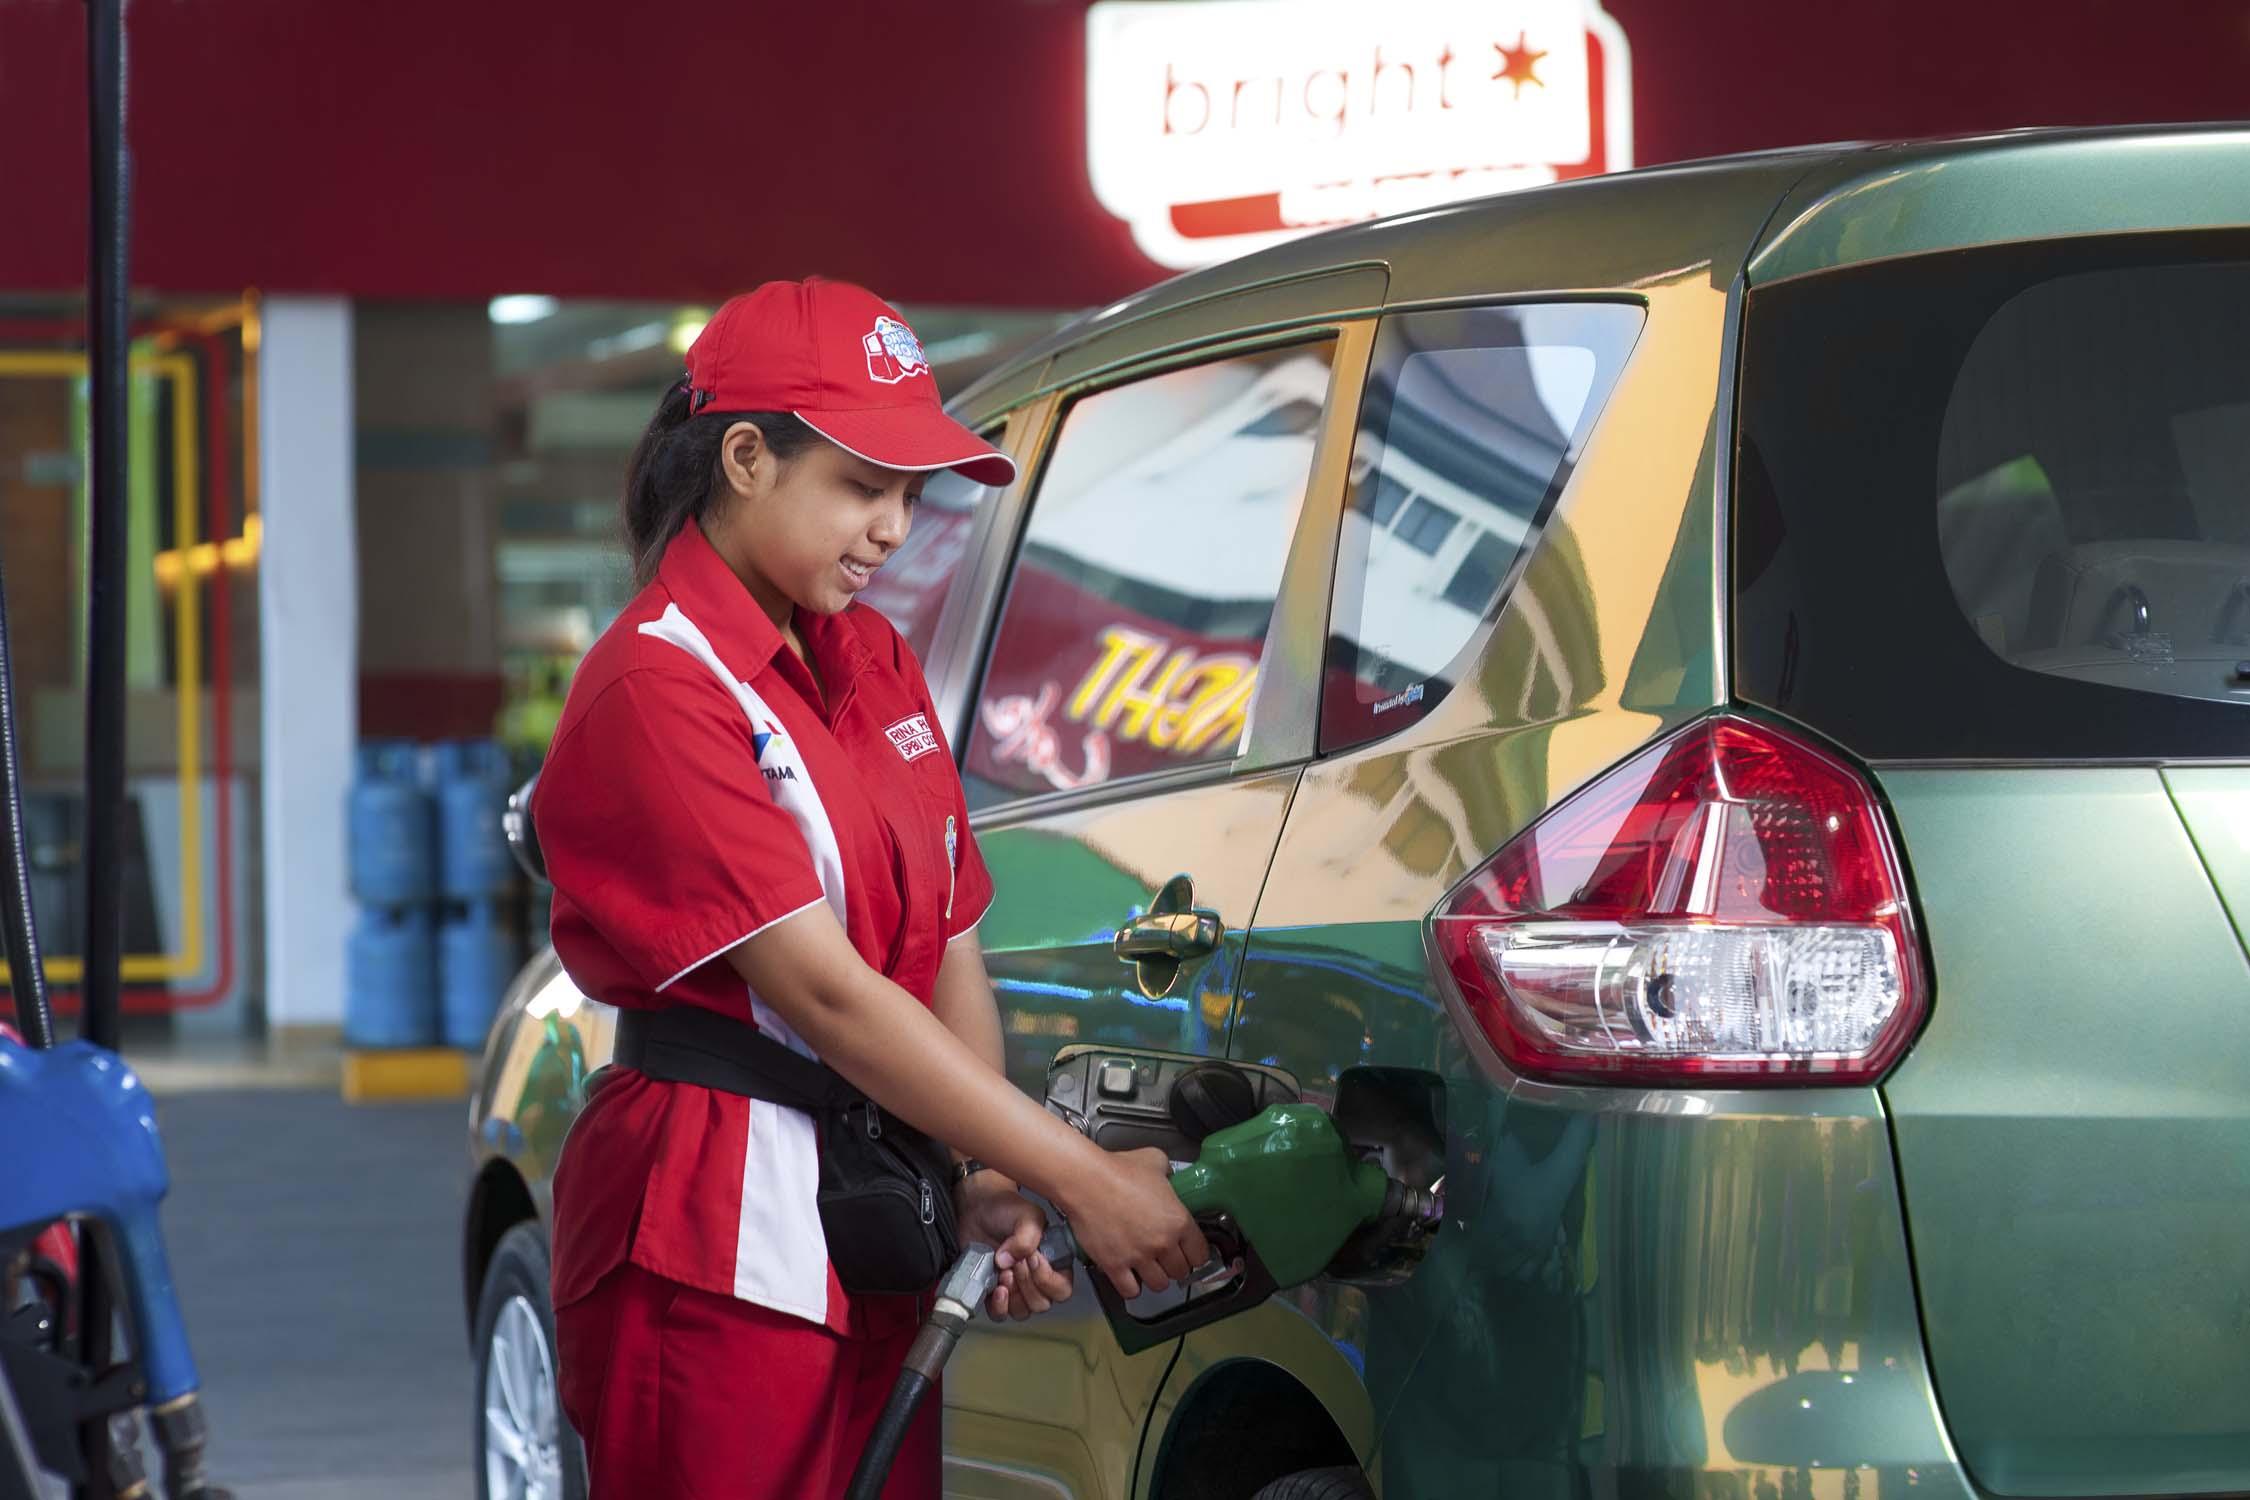 Konsumsi BBM Meningkat, Pertamina Pastikan Stok Aman